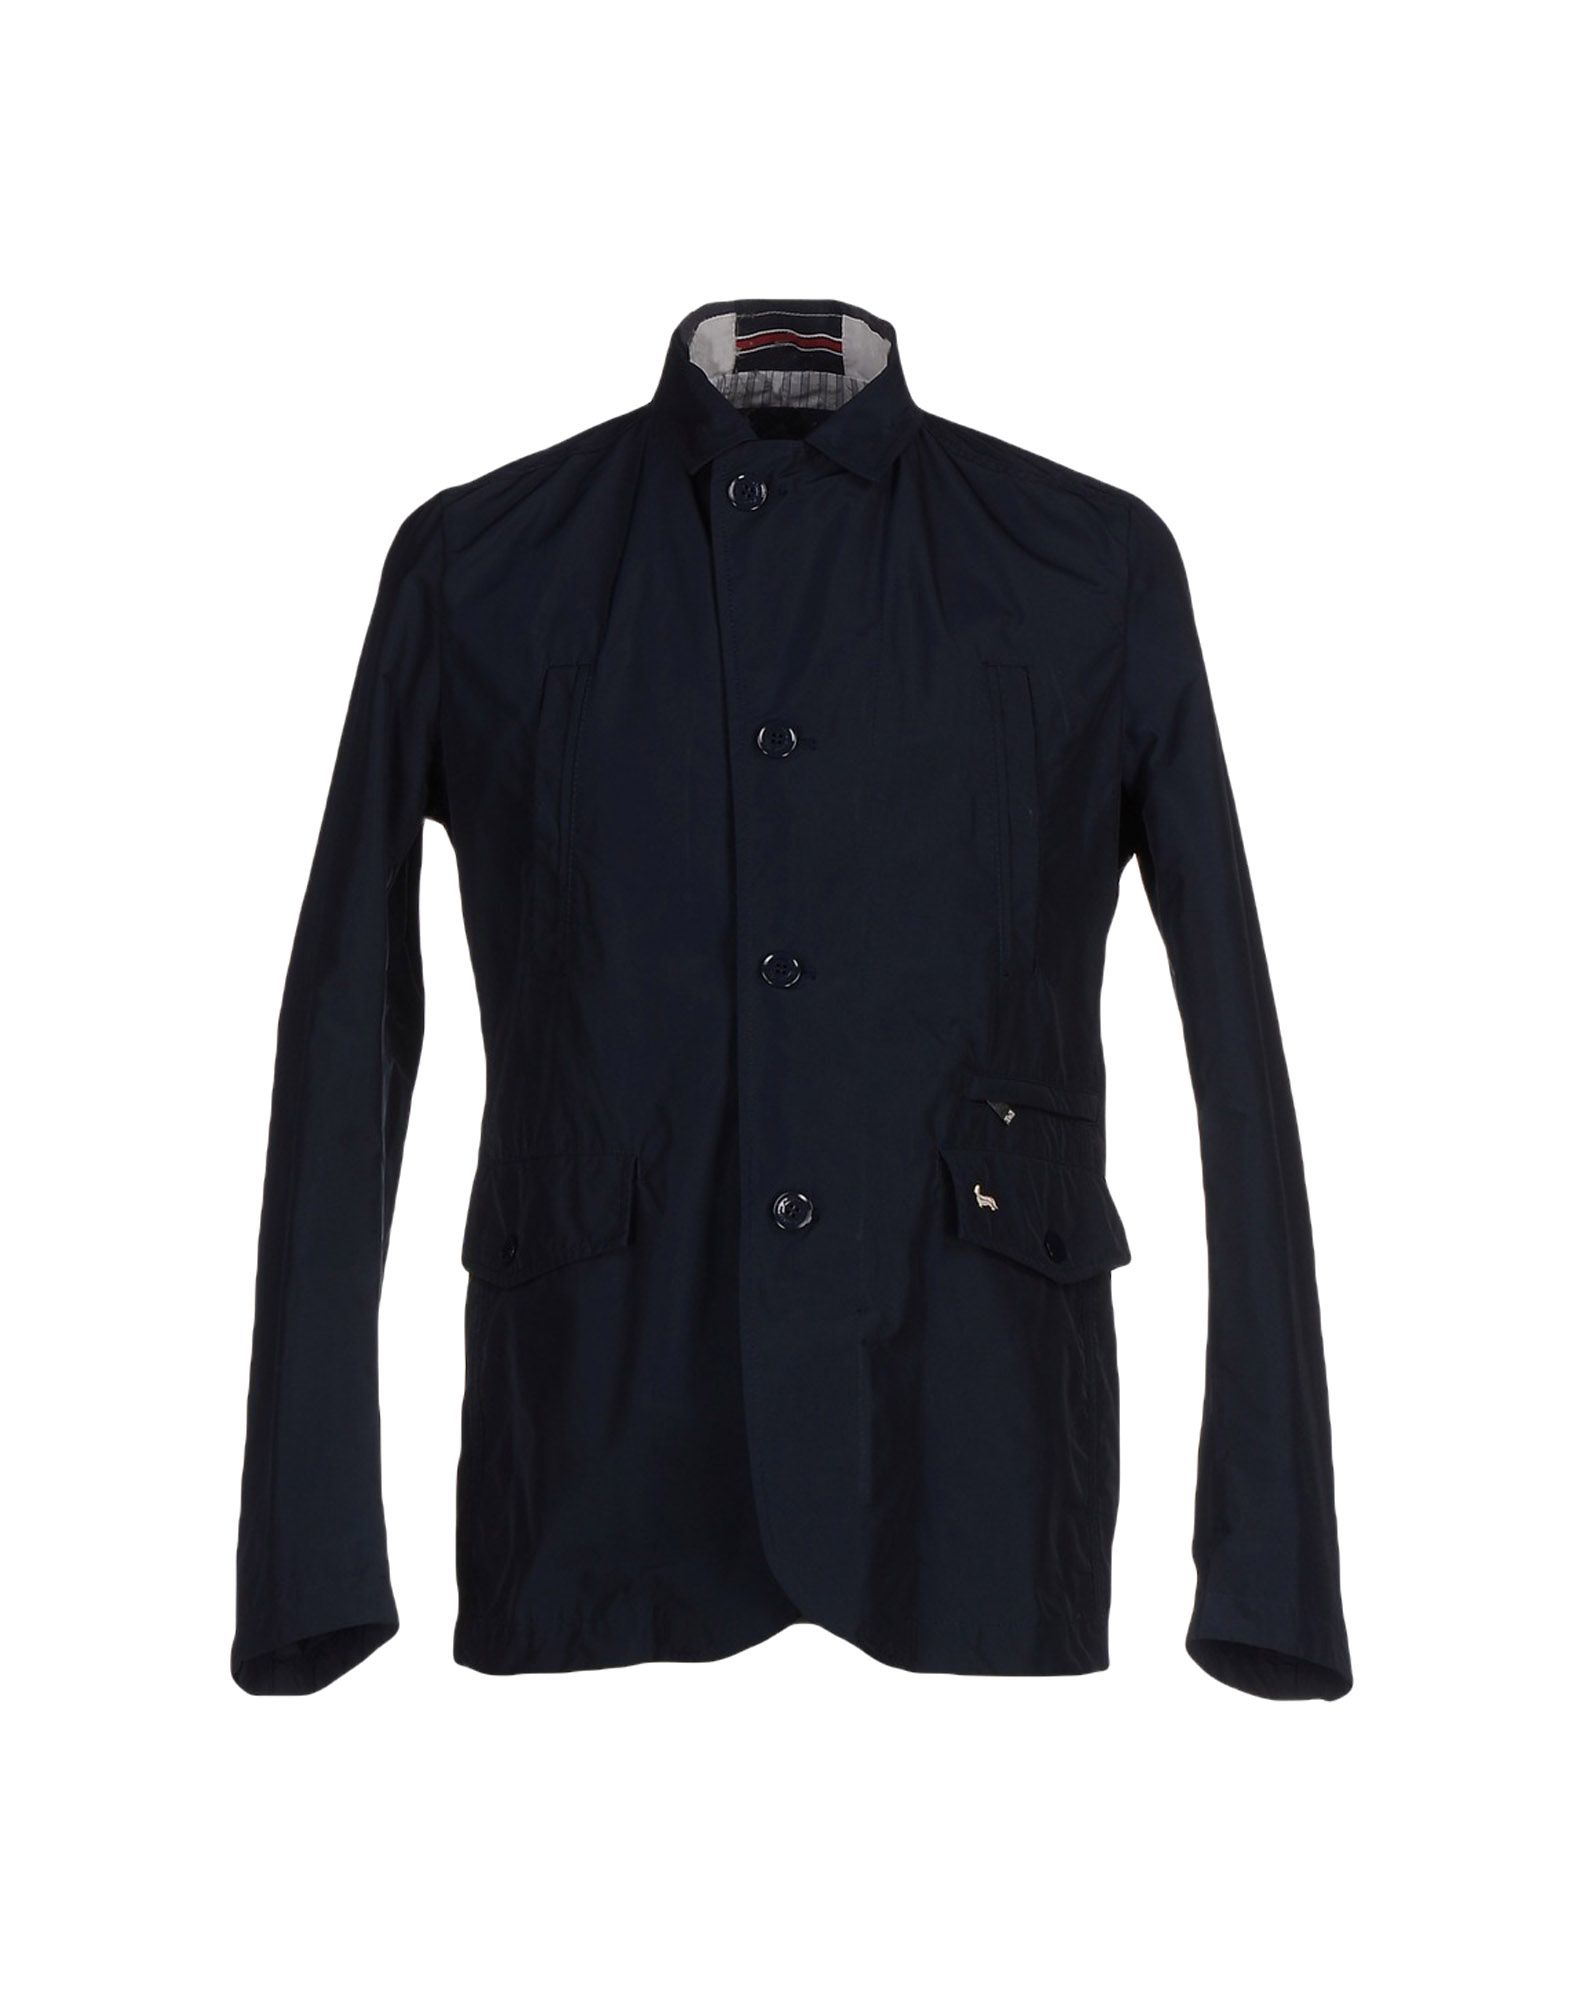 harmont and blaine jacket -#main